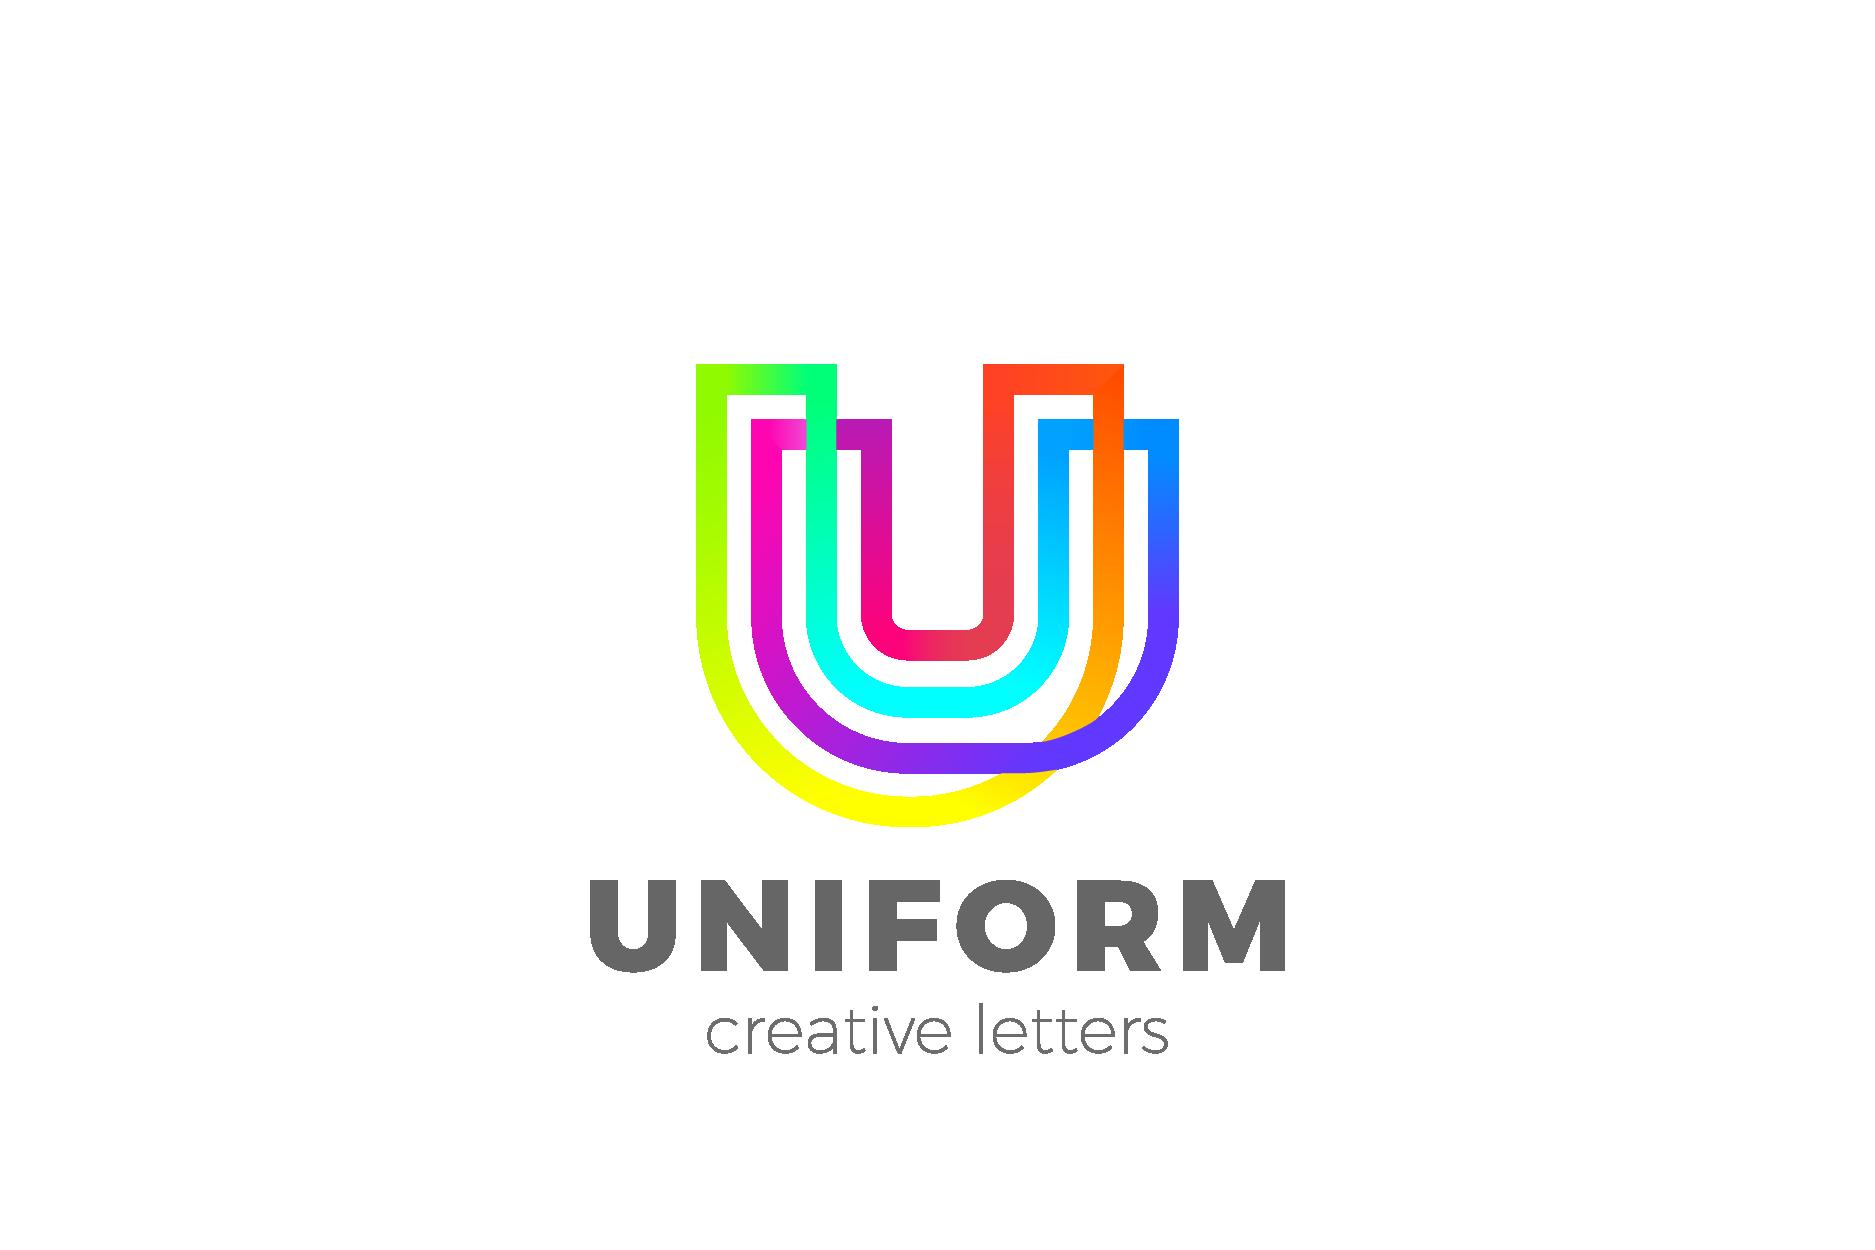 19_Uniform.png